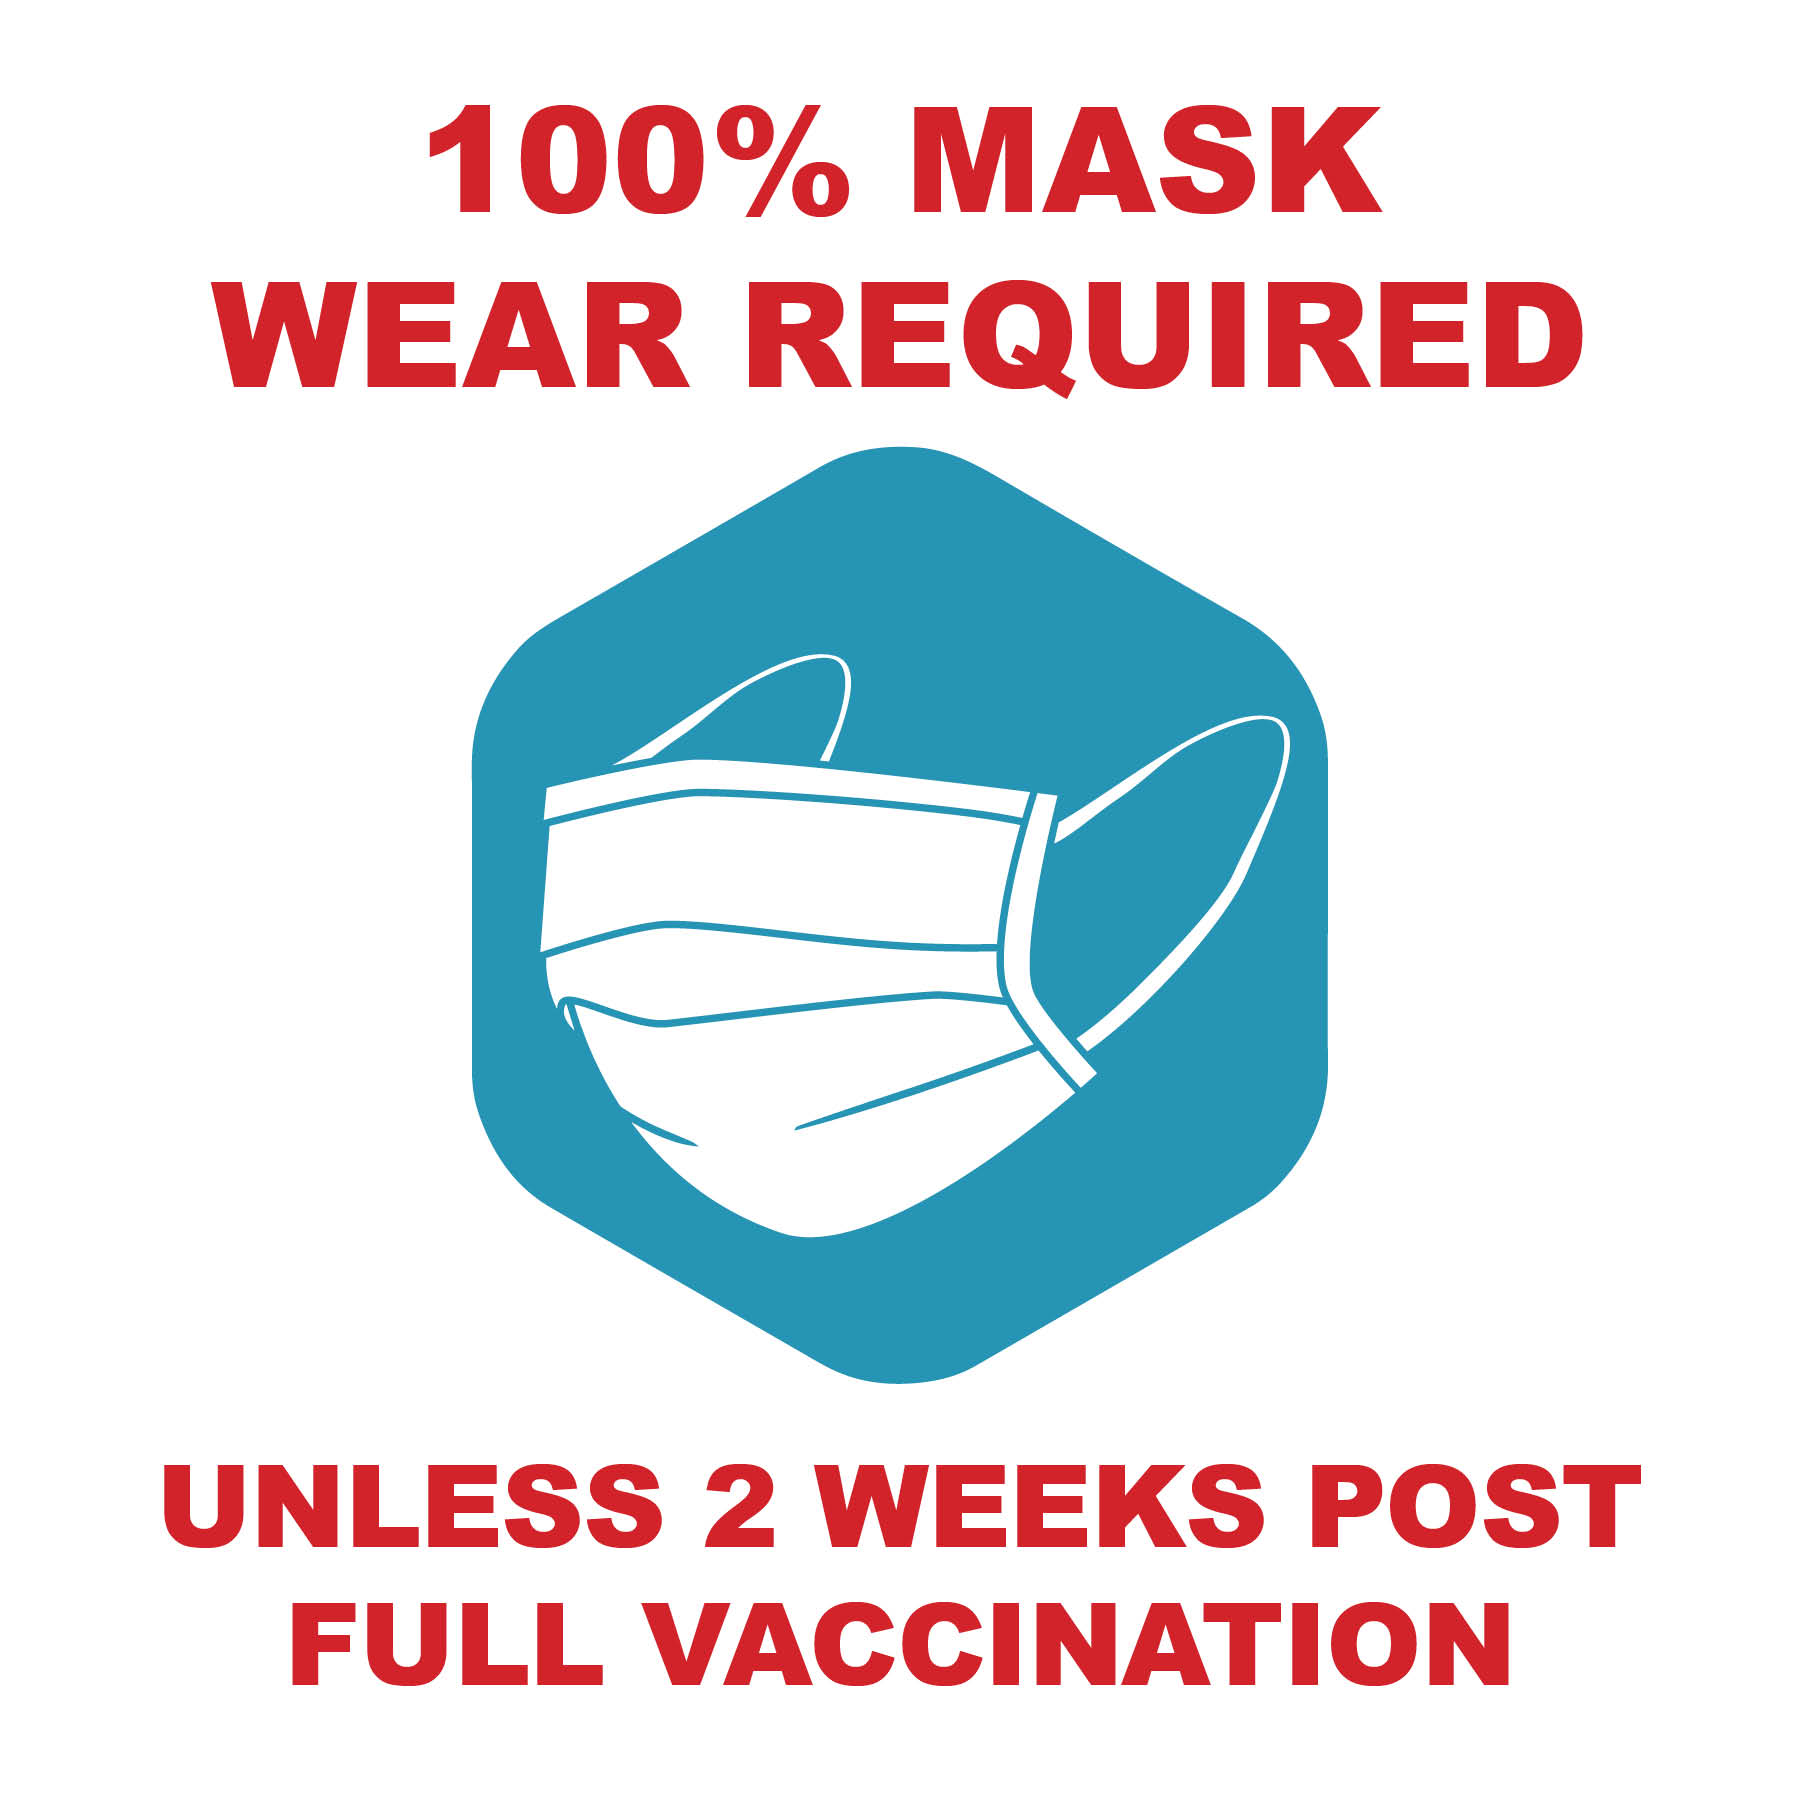 Mask-Wear-Update-May-21